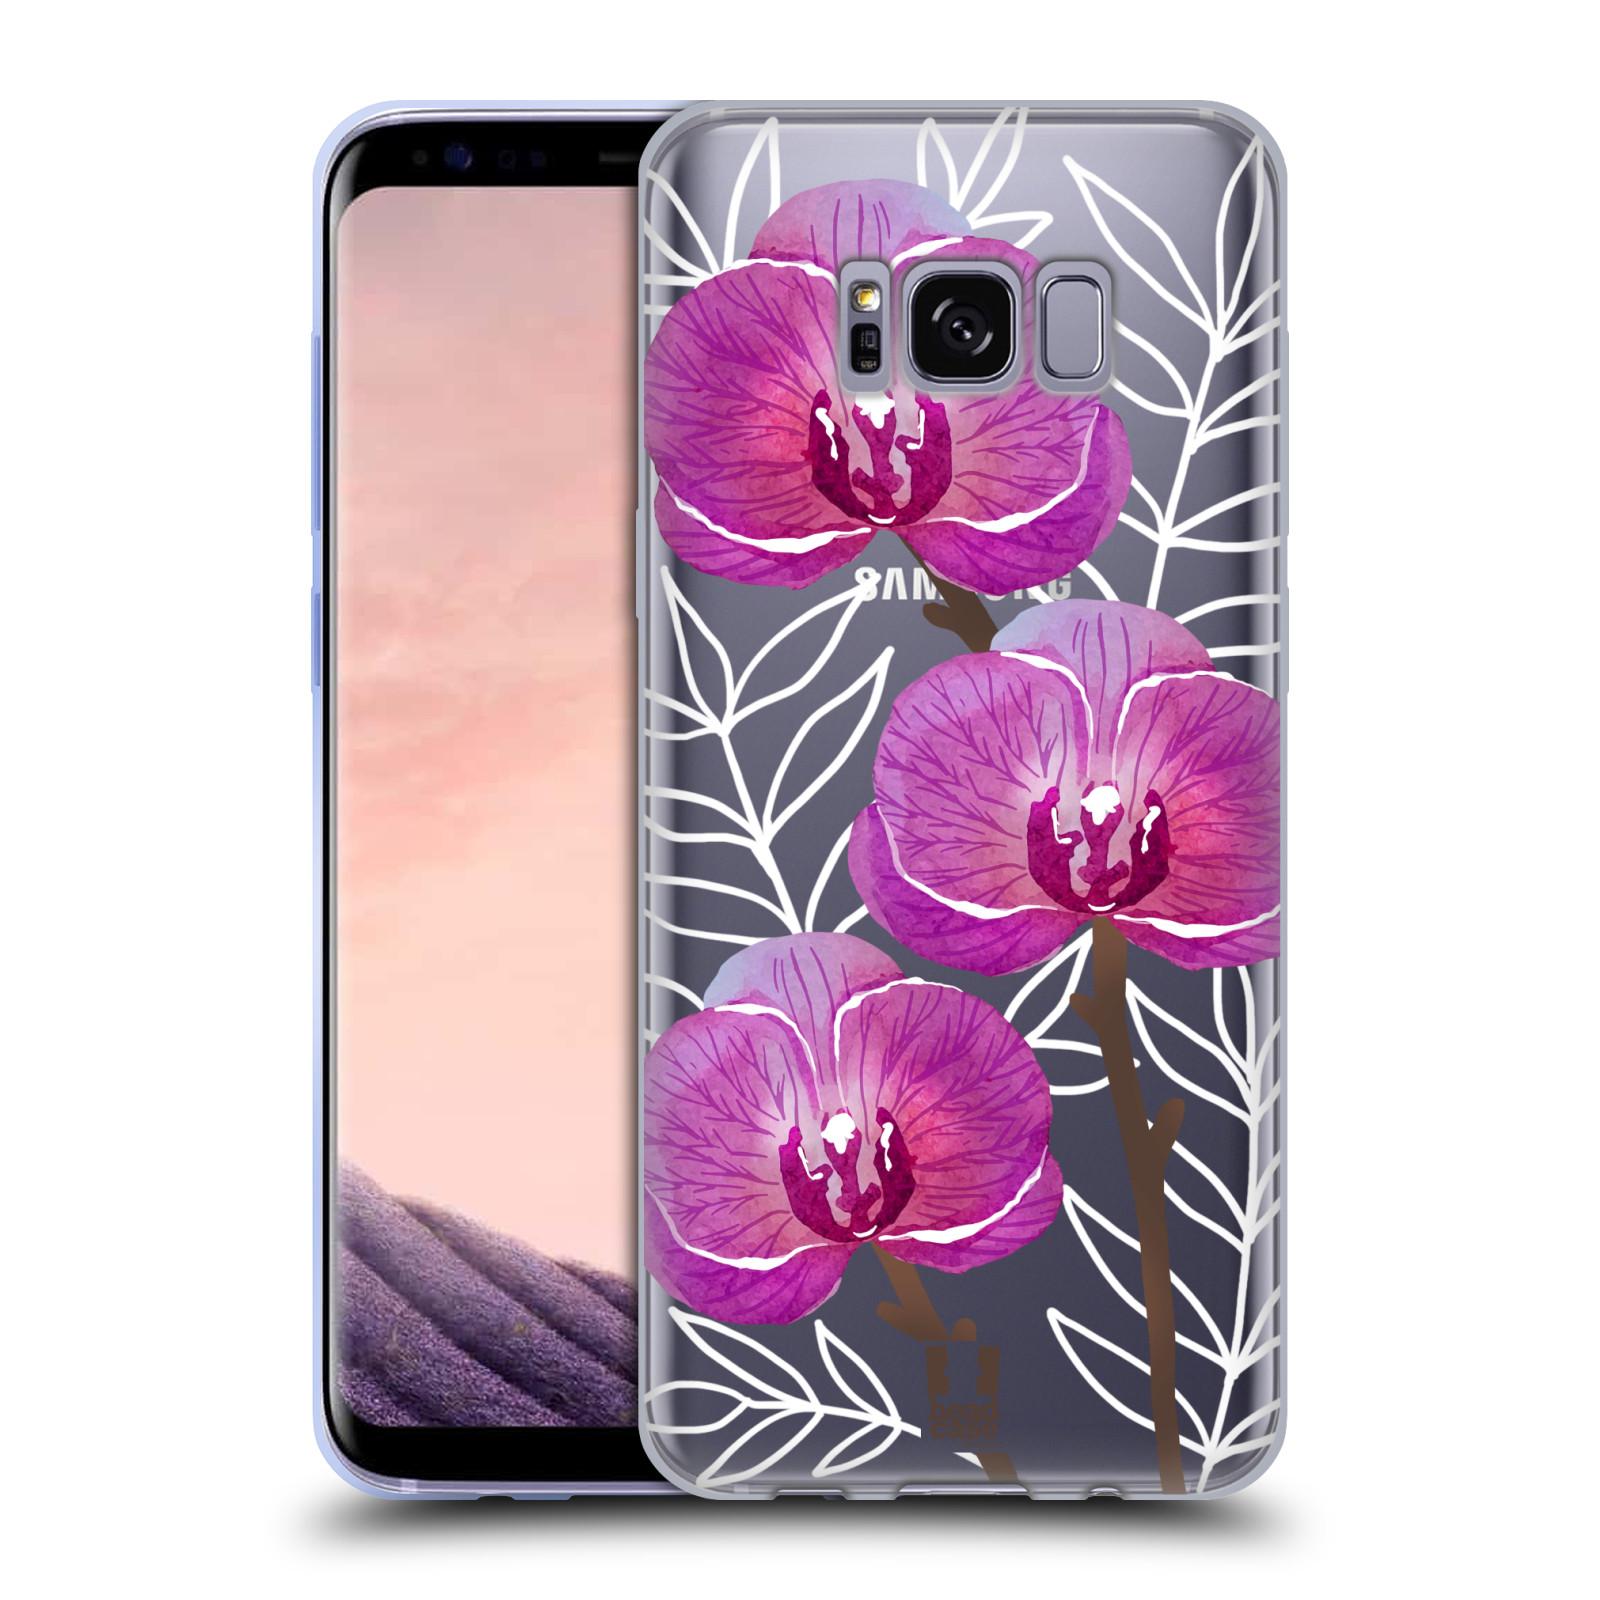 Silikonové pouzdro na mobil Samsung Galaxy S8 - Head Case - Hezoučké kvítky - průhledné